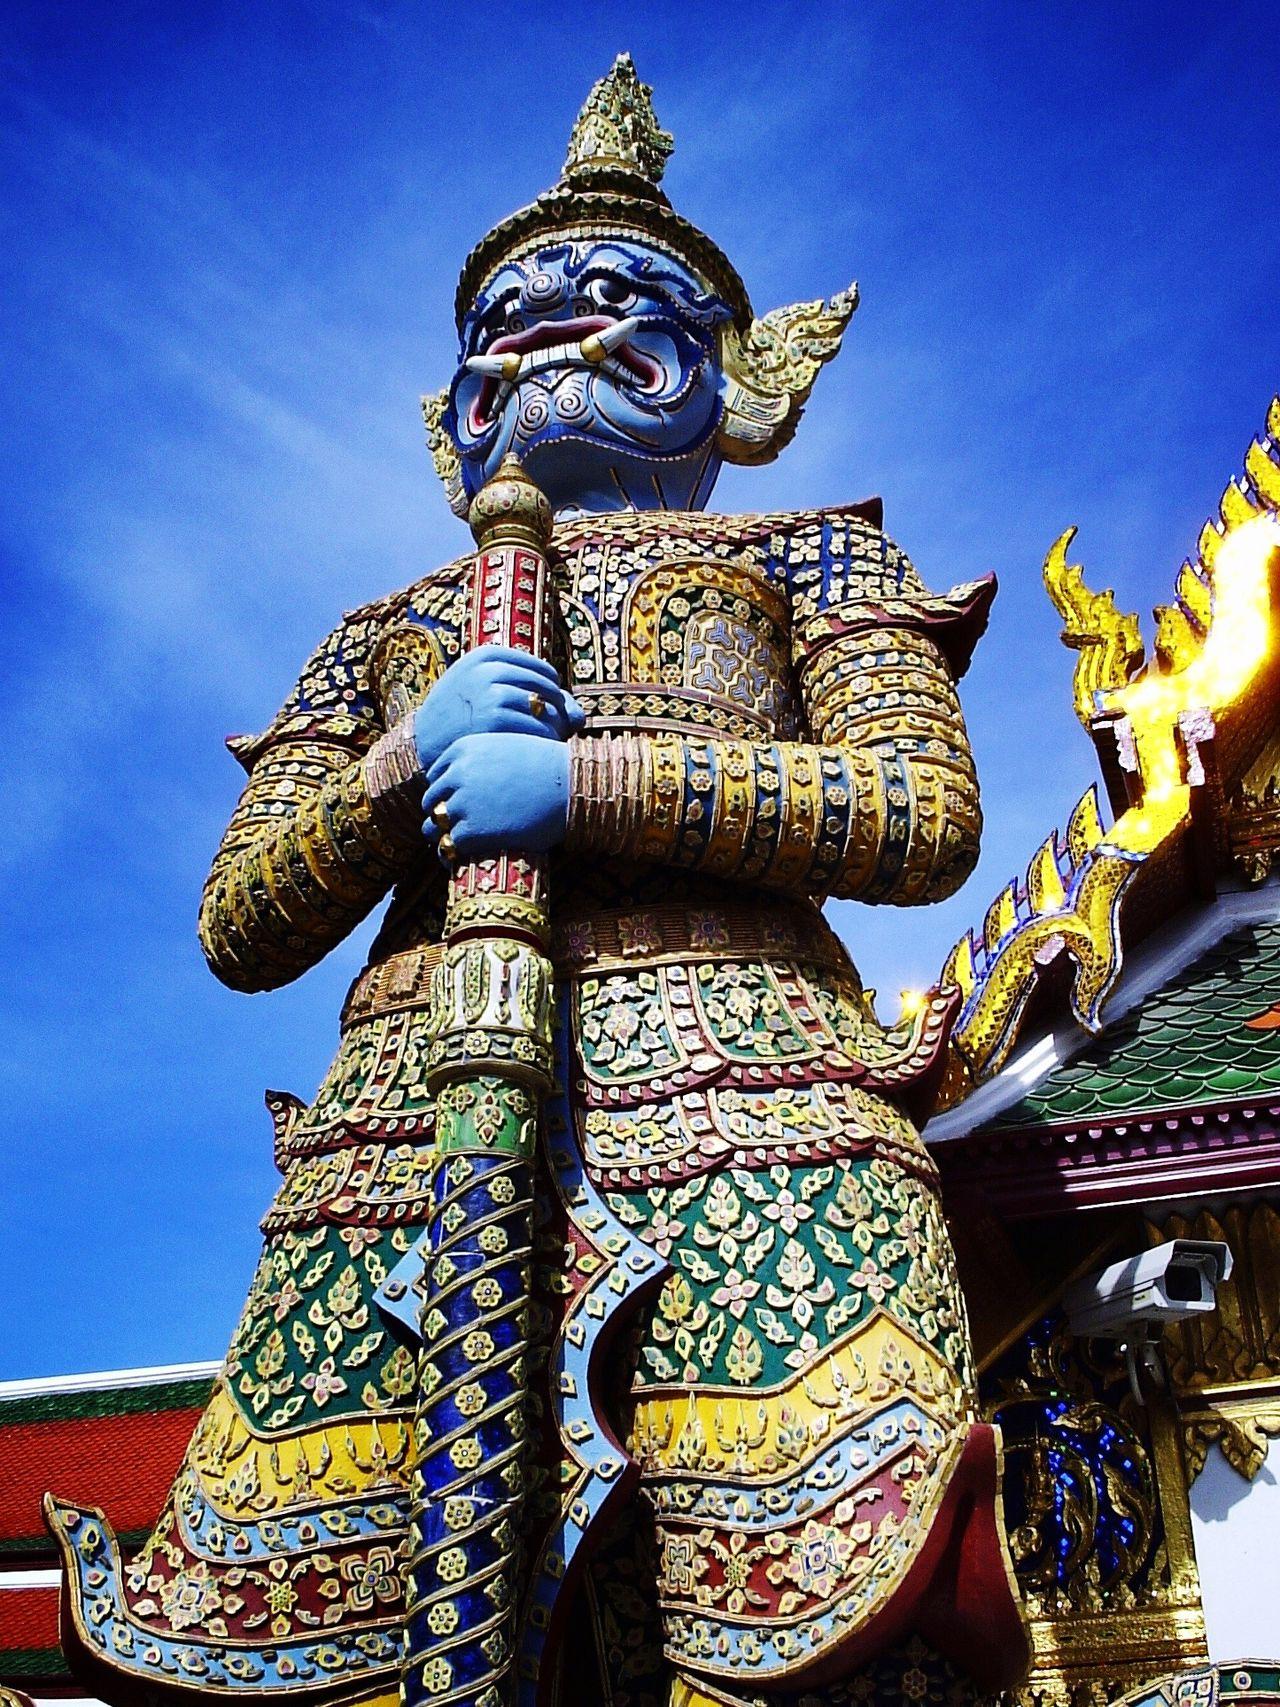 Old and New Surveillance Bangkok Guardian Temple Palace Guard Statue Thailand Securitycam Security